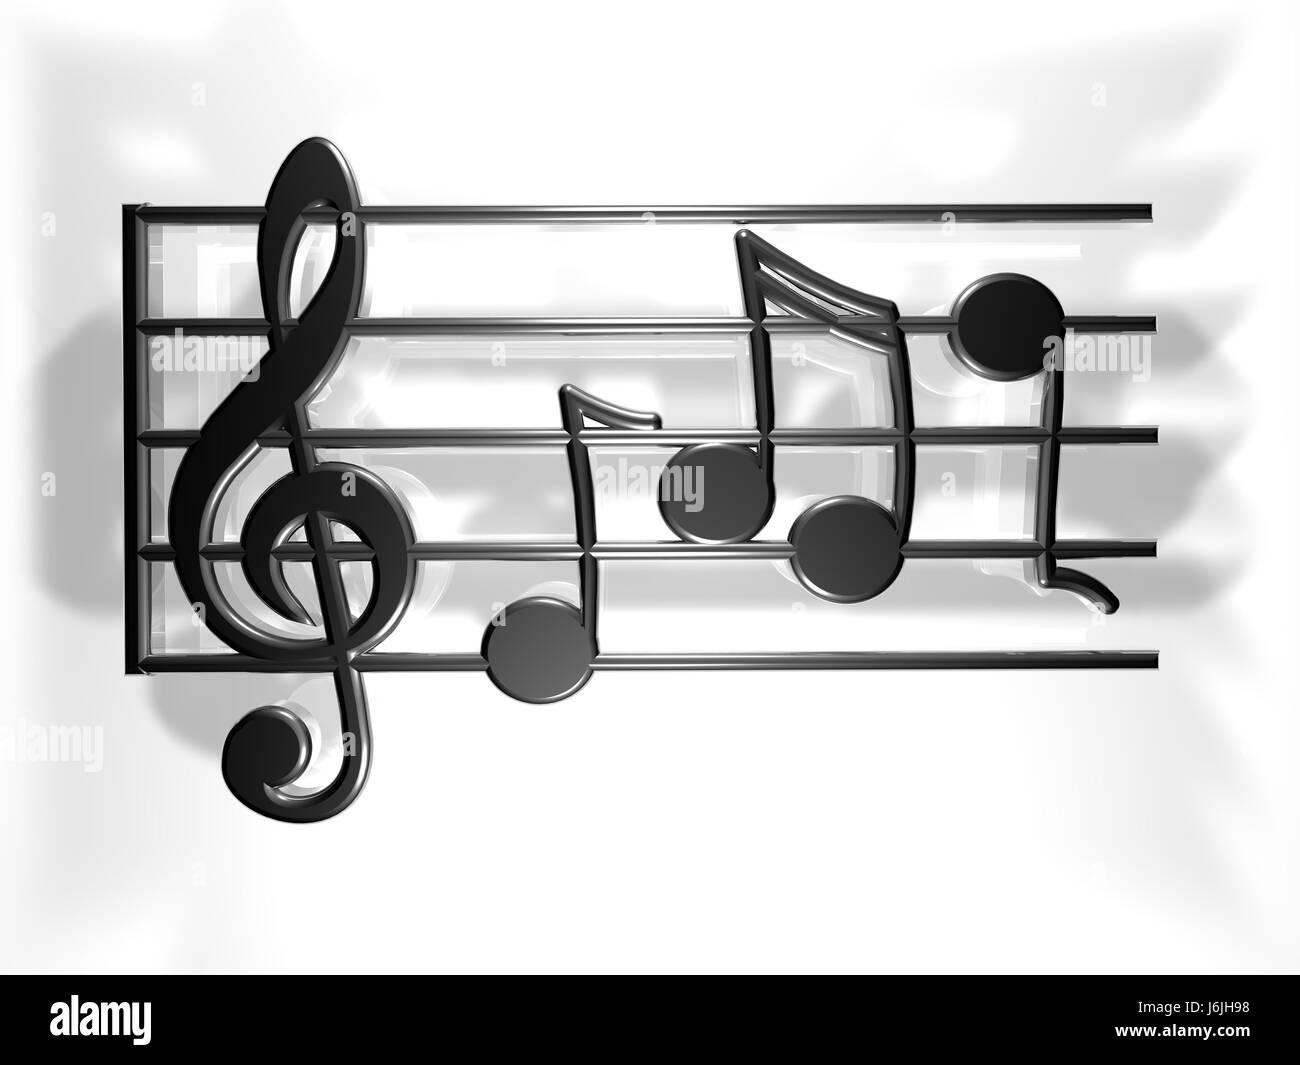 Tonos De Musica Notas Clef Tono Tonos Musicales Notas Nota Opcional